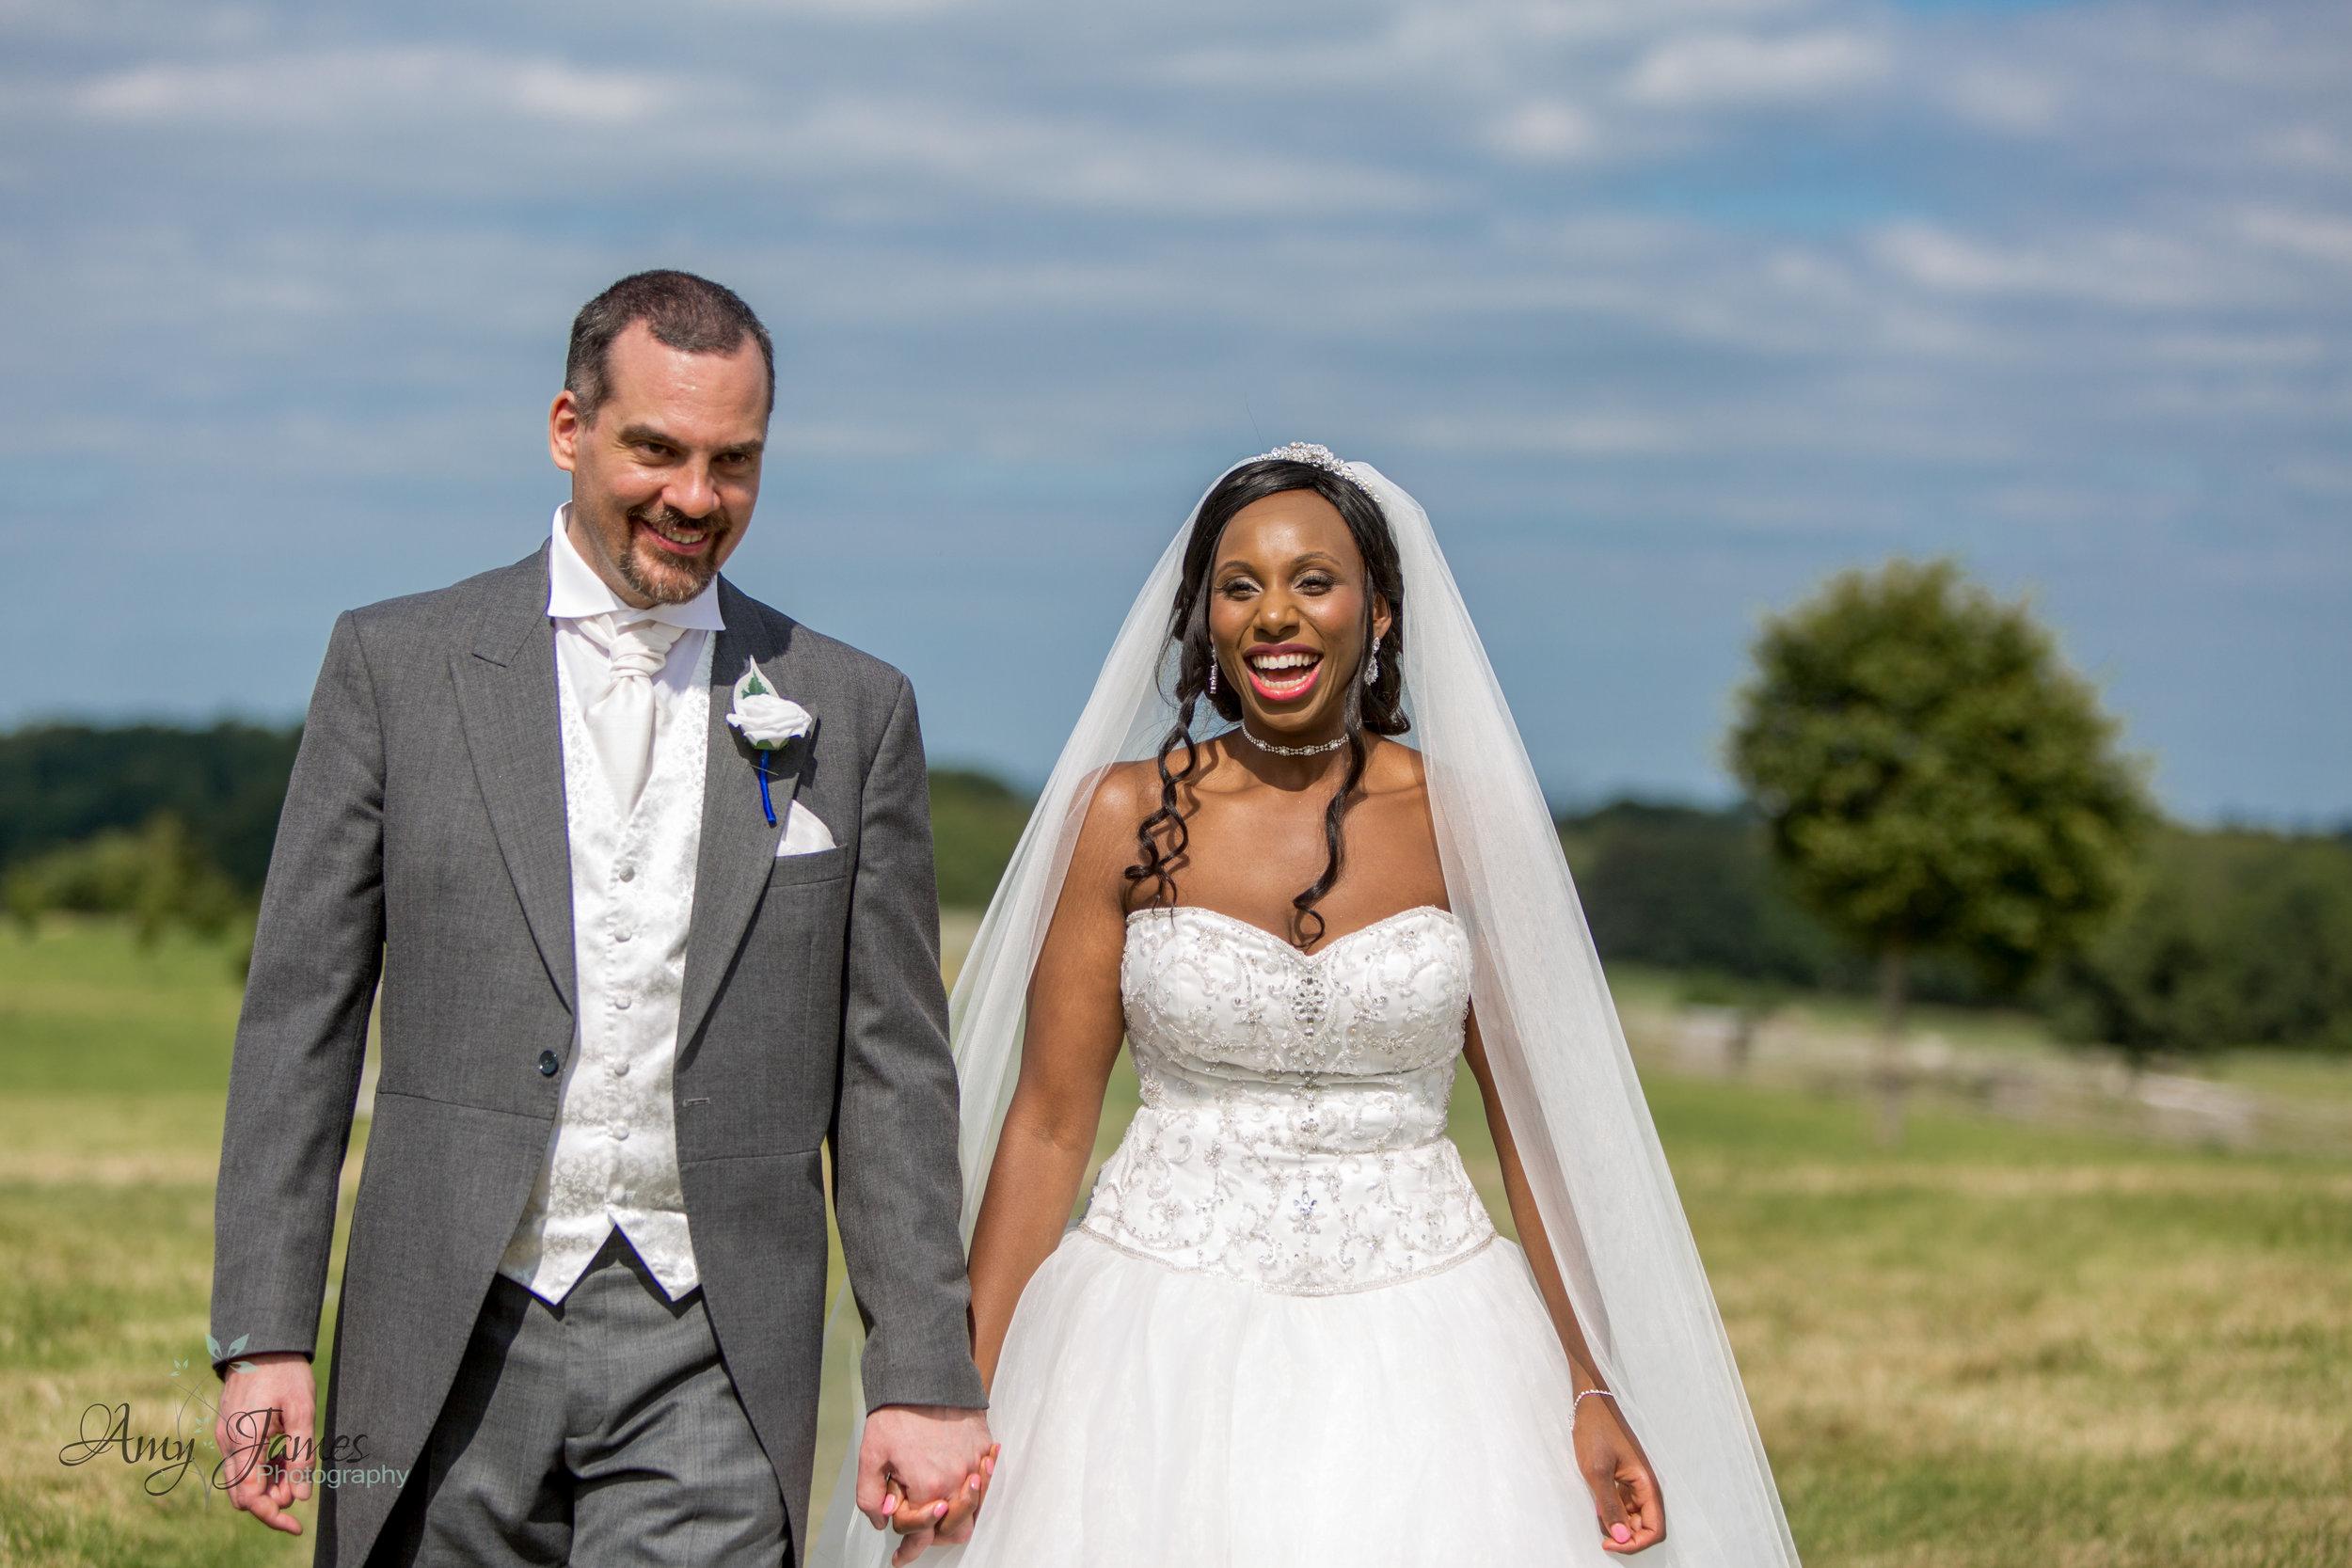 Hampshire Four Seasons Hotel Wedding Venue - Hampshire wedding Photographer - Fleet wedding photographer - Amy James Photography-81.jpg